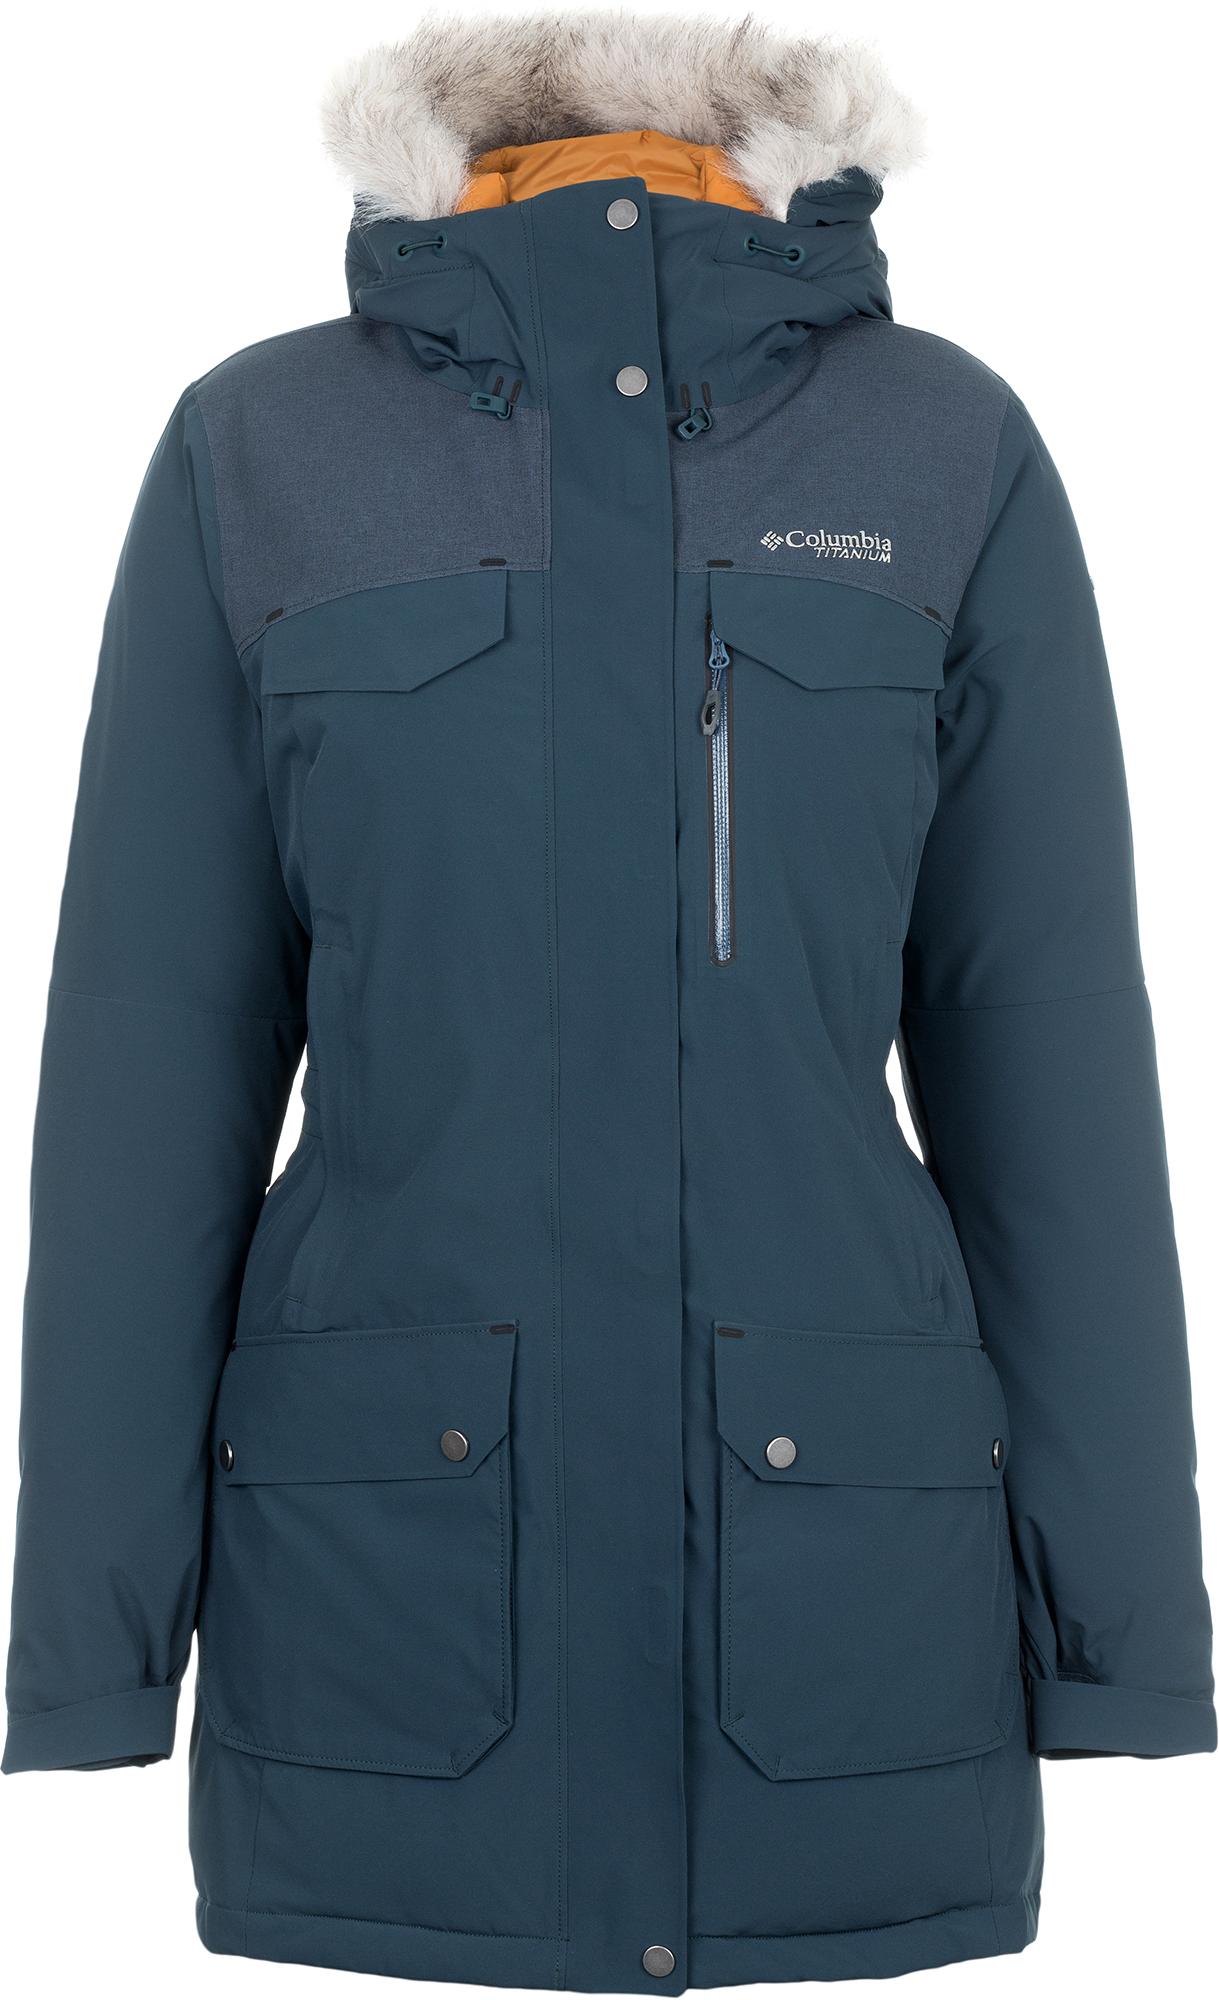 Columbia Куртка пуховая женская Columbia Titan Pass 780 TurboDown, размер 46 pajar куртка пуховая женская cougar xl jet black